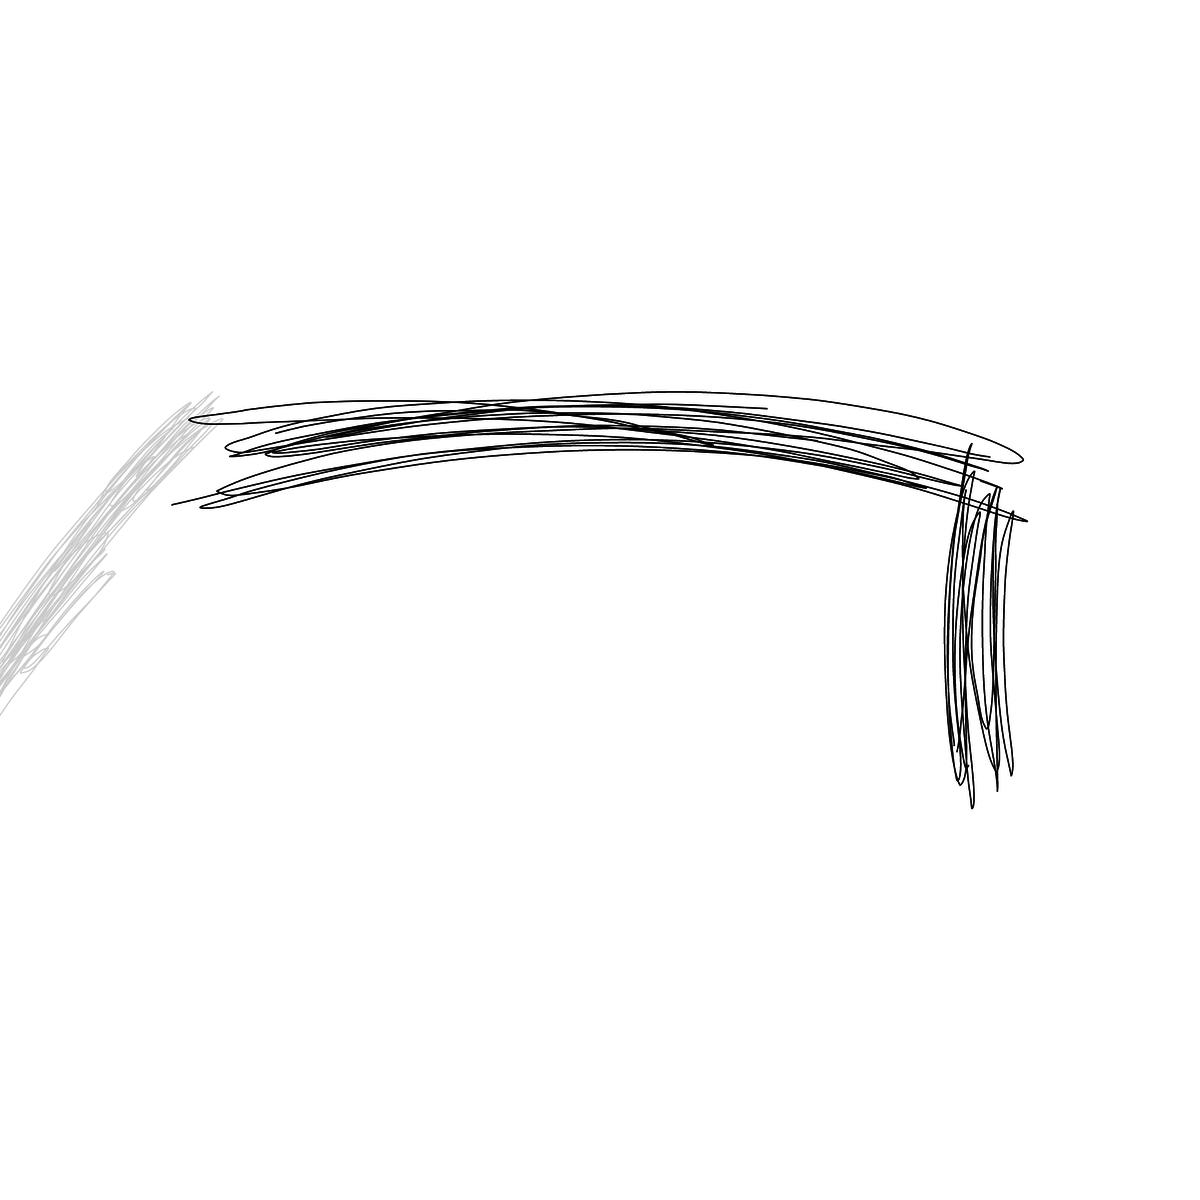 BAAAM drawing#23541 lat:65.0165176391601600lng: -158.3015594482422000